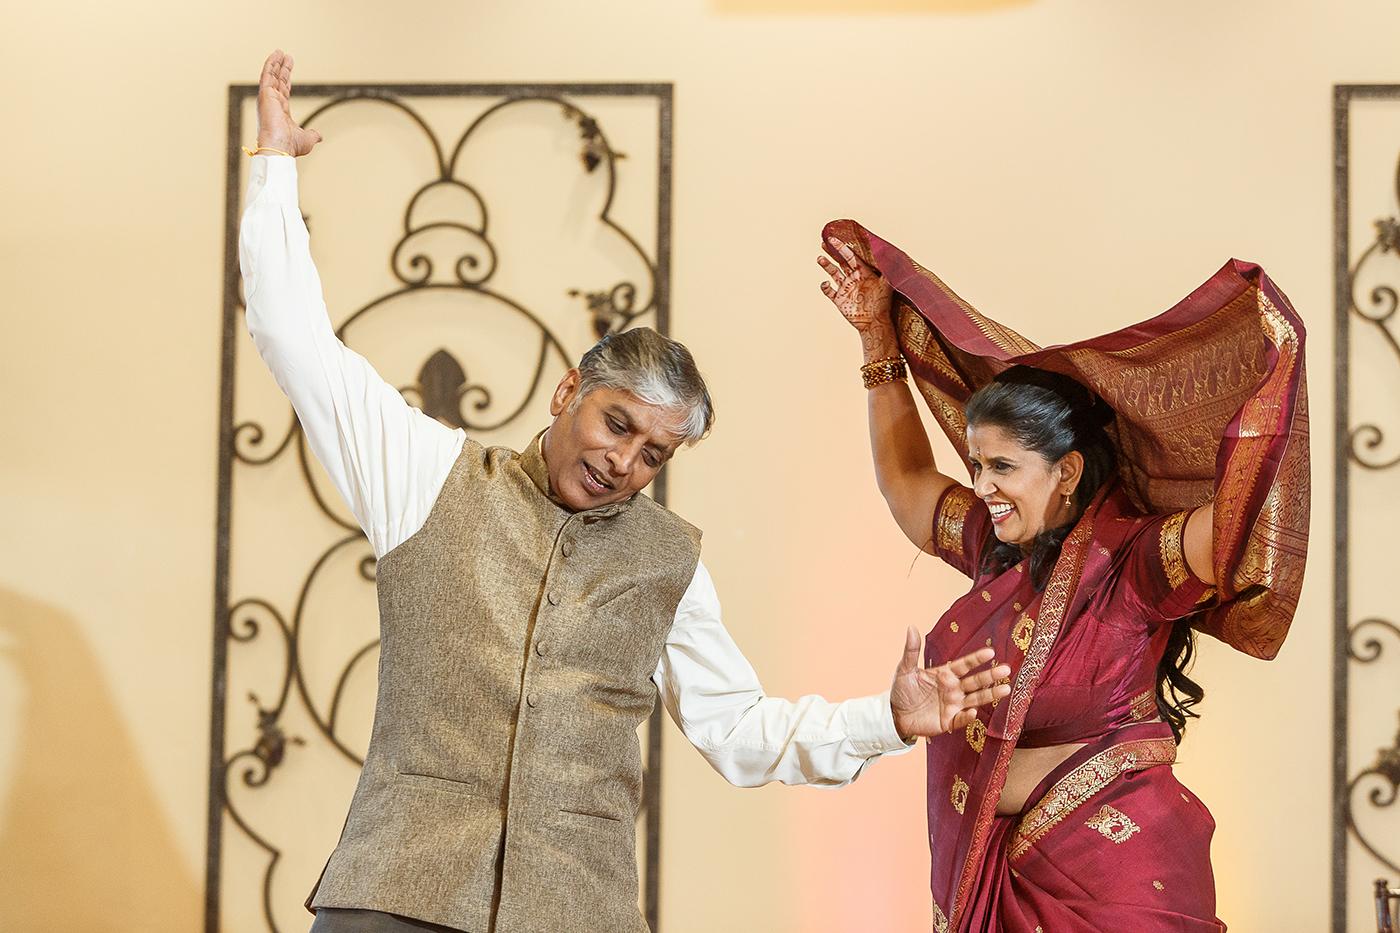 Parents of bride dance